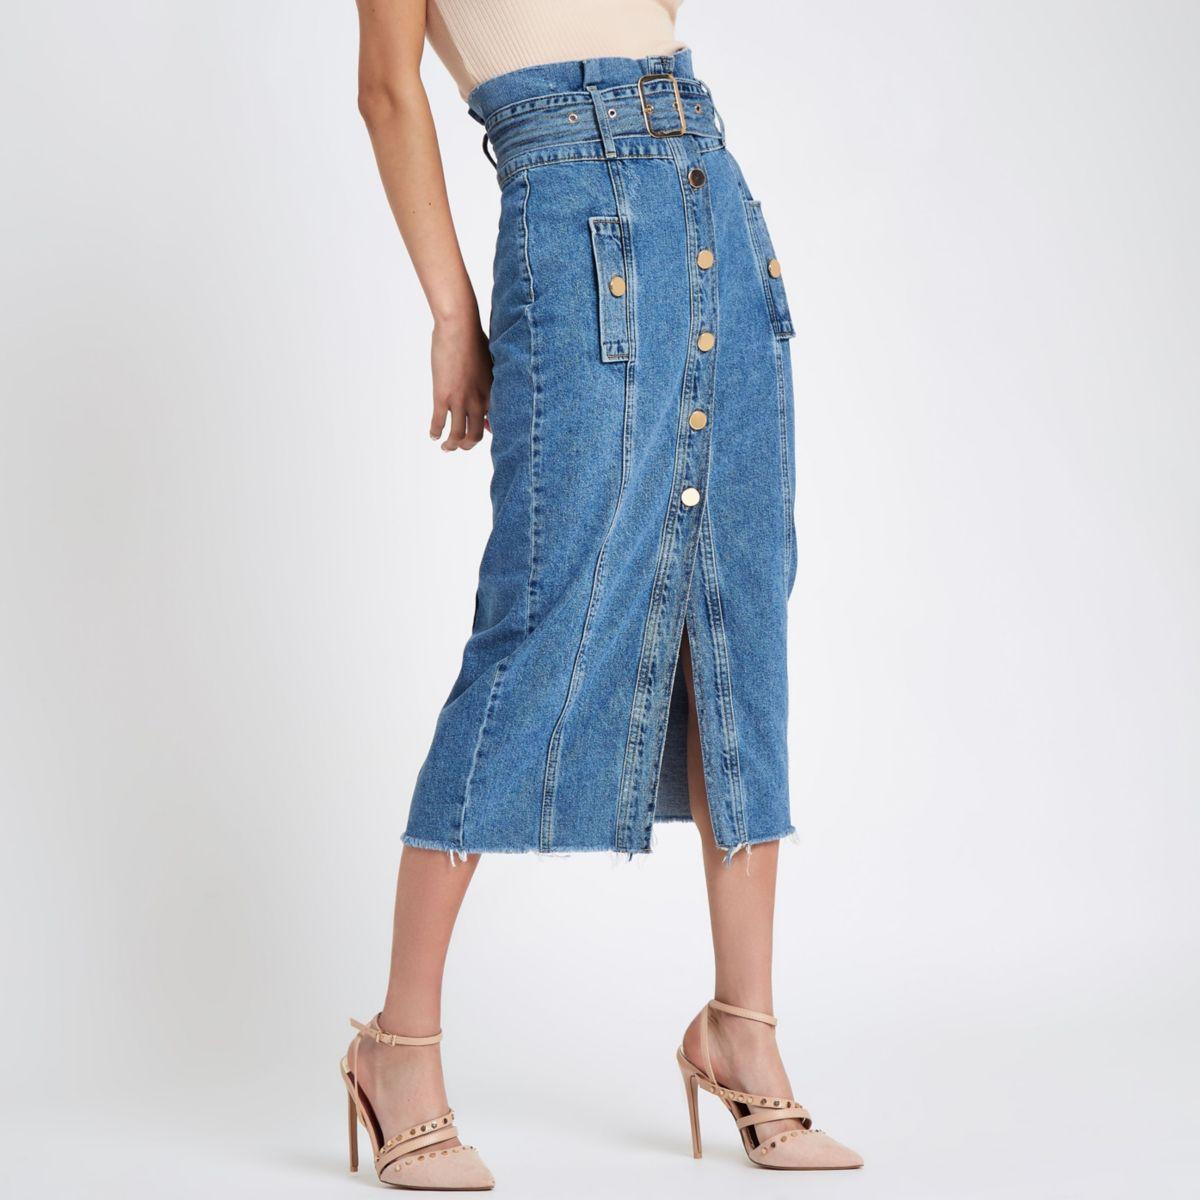 Mid blue button belted denim pencil skirt